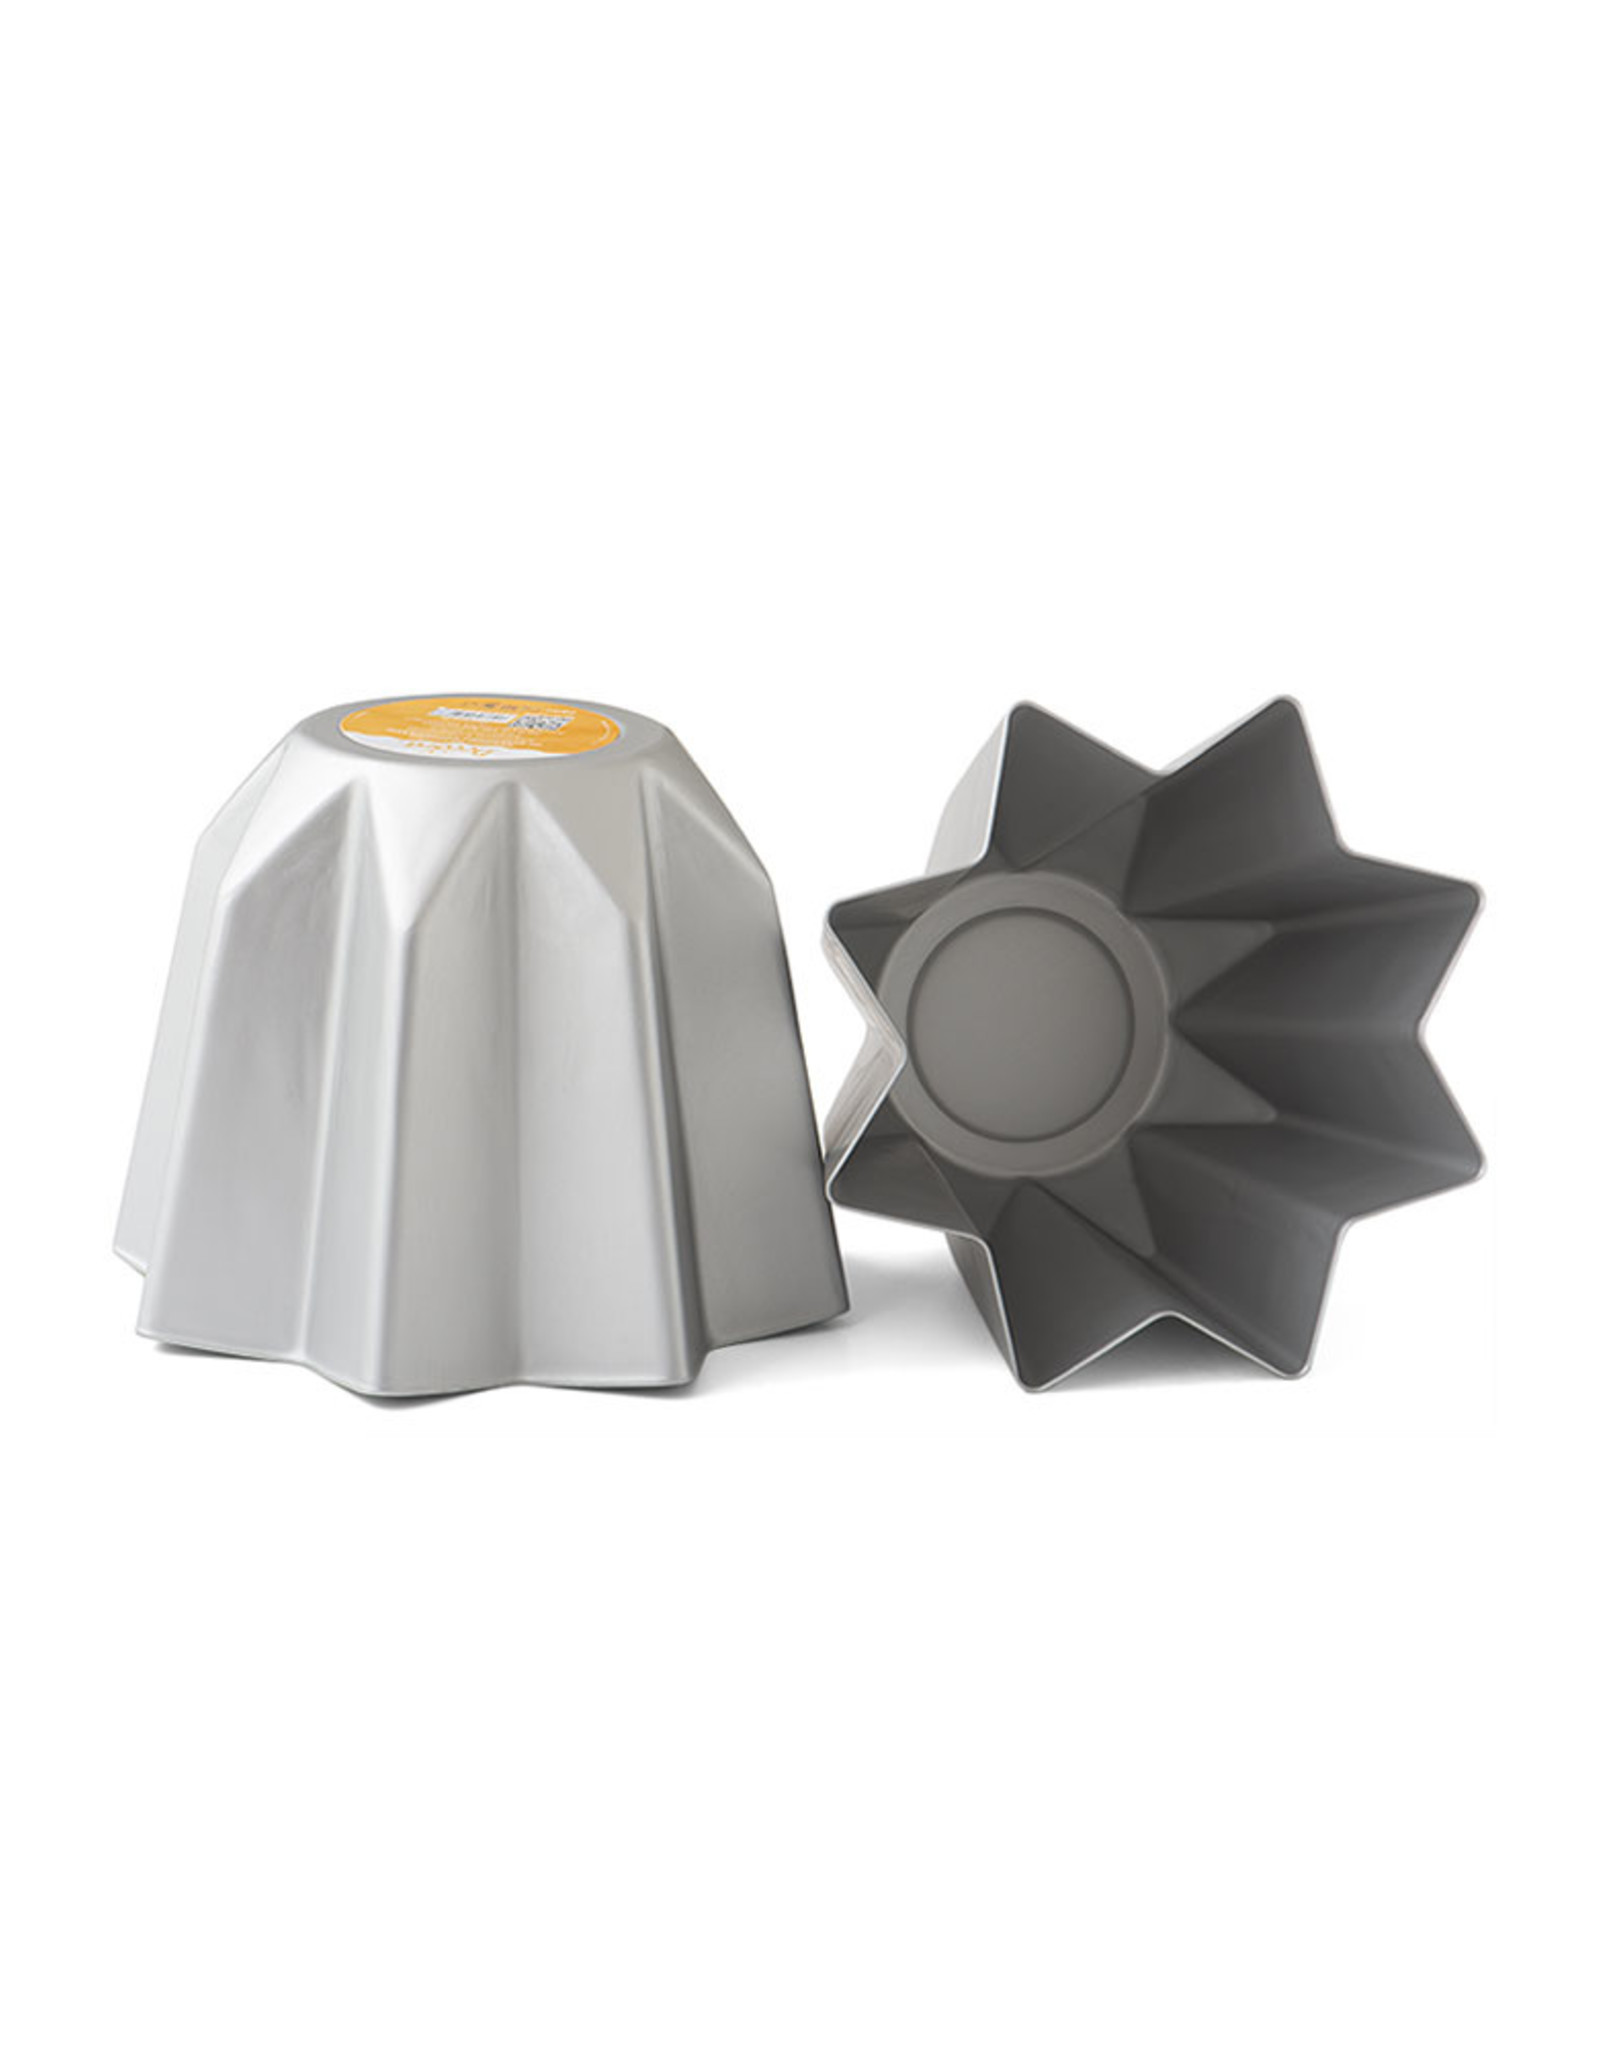 Decora Decora Prof Aluminium Pandoro Bakvorm 750g